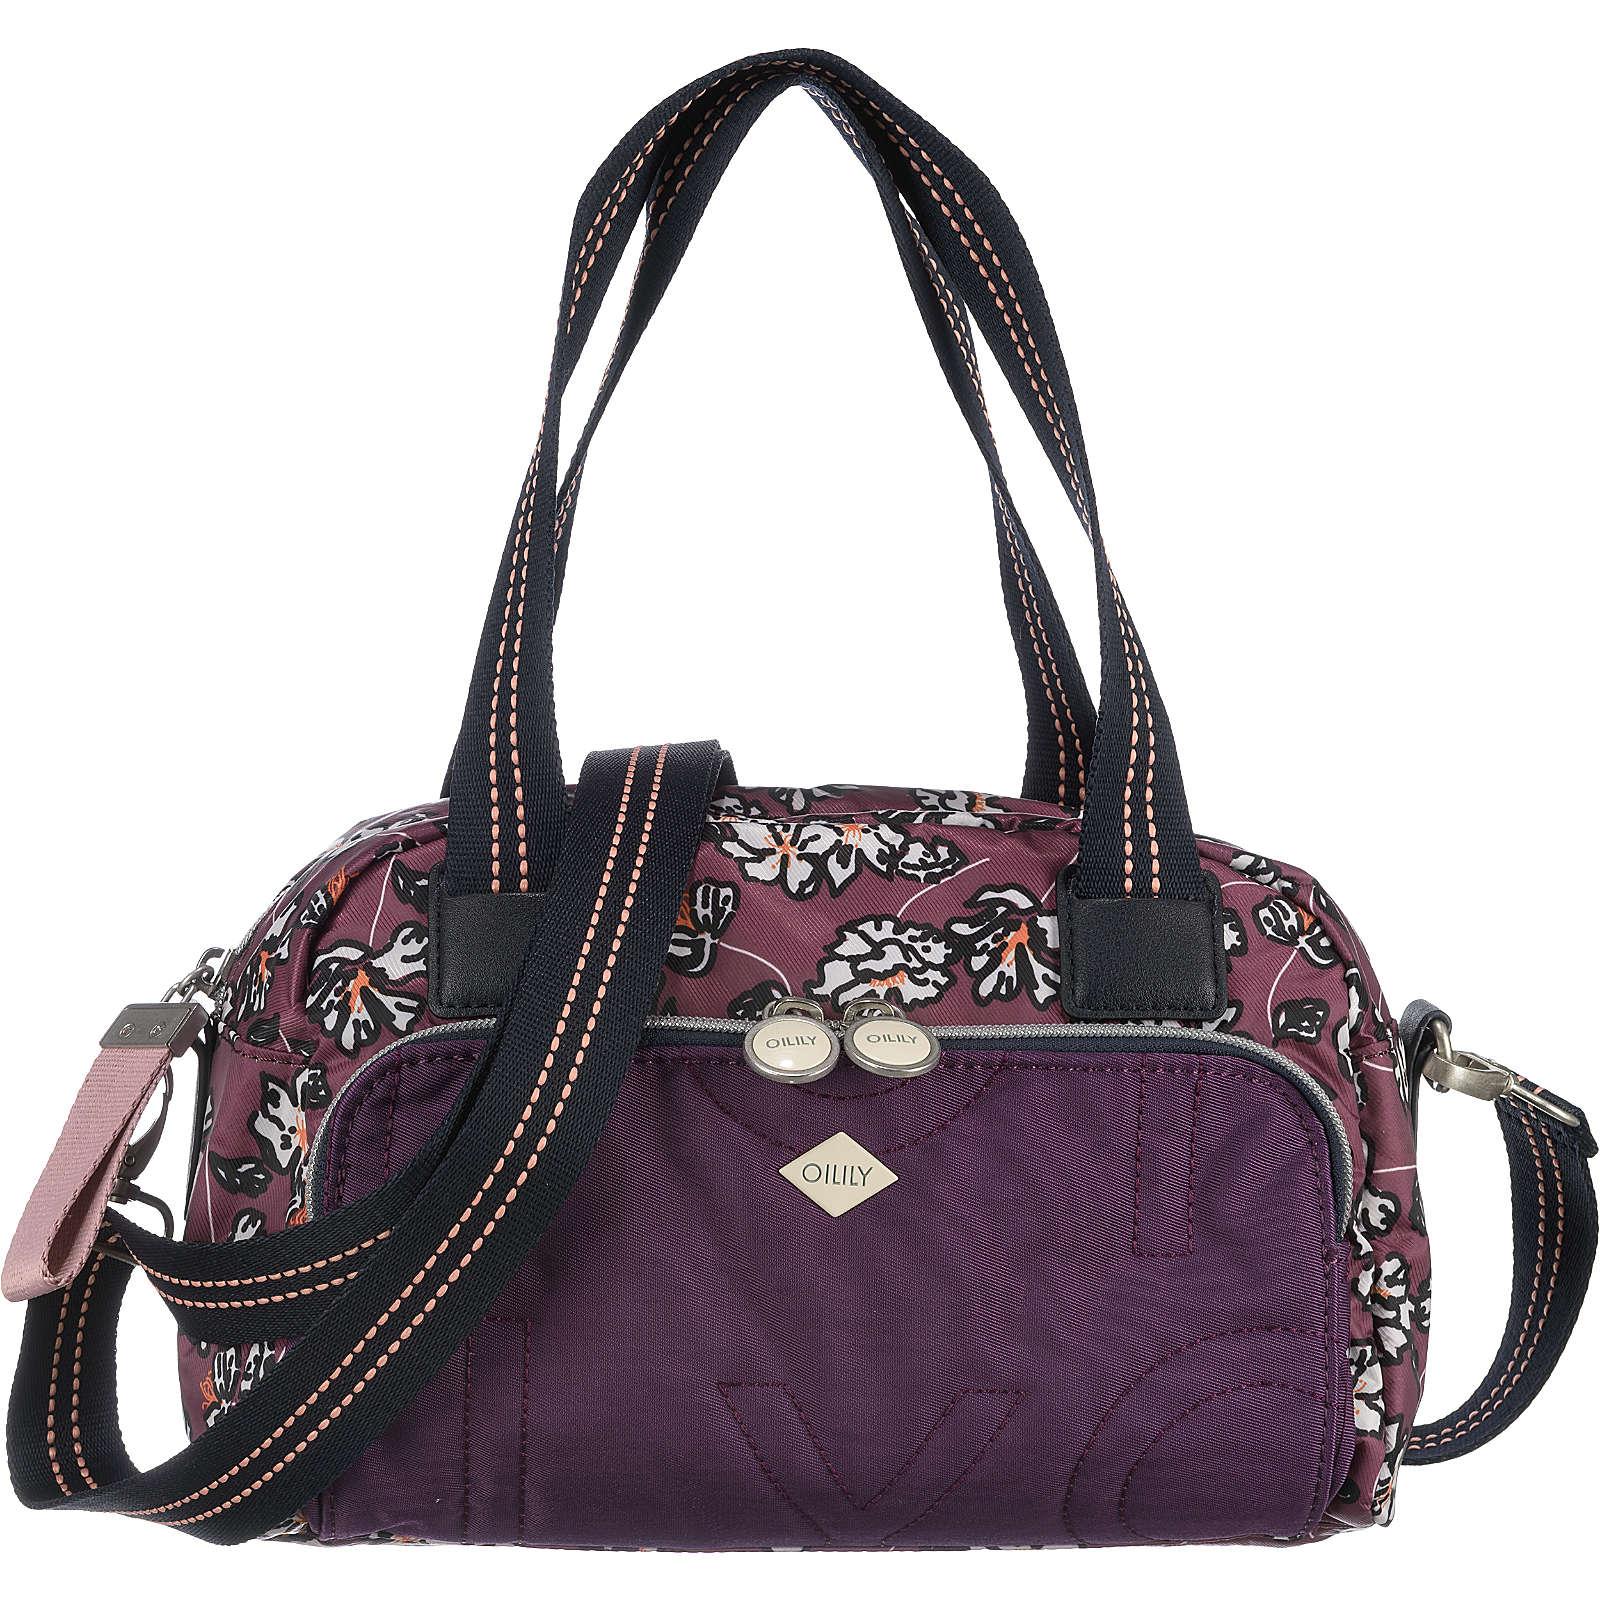 Oilily Charm Handtasche lila Damen